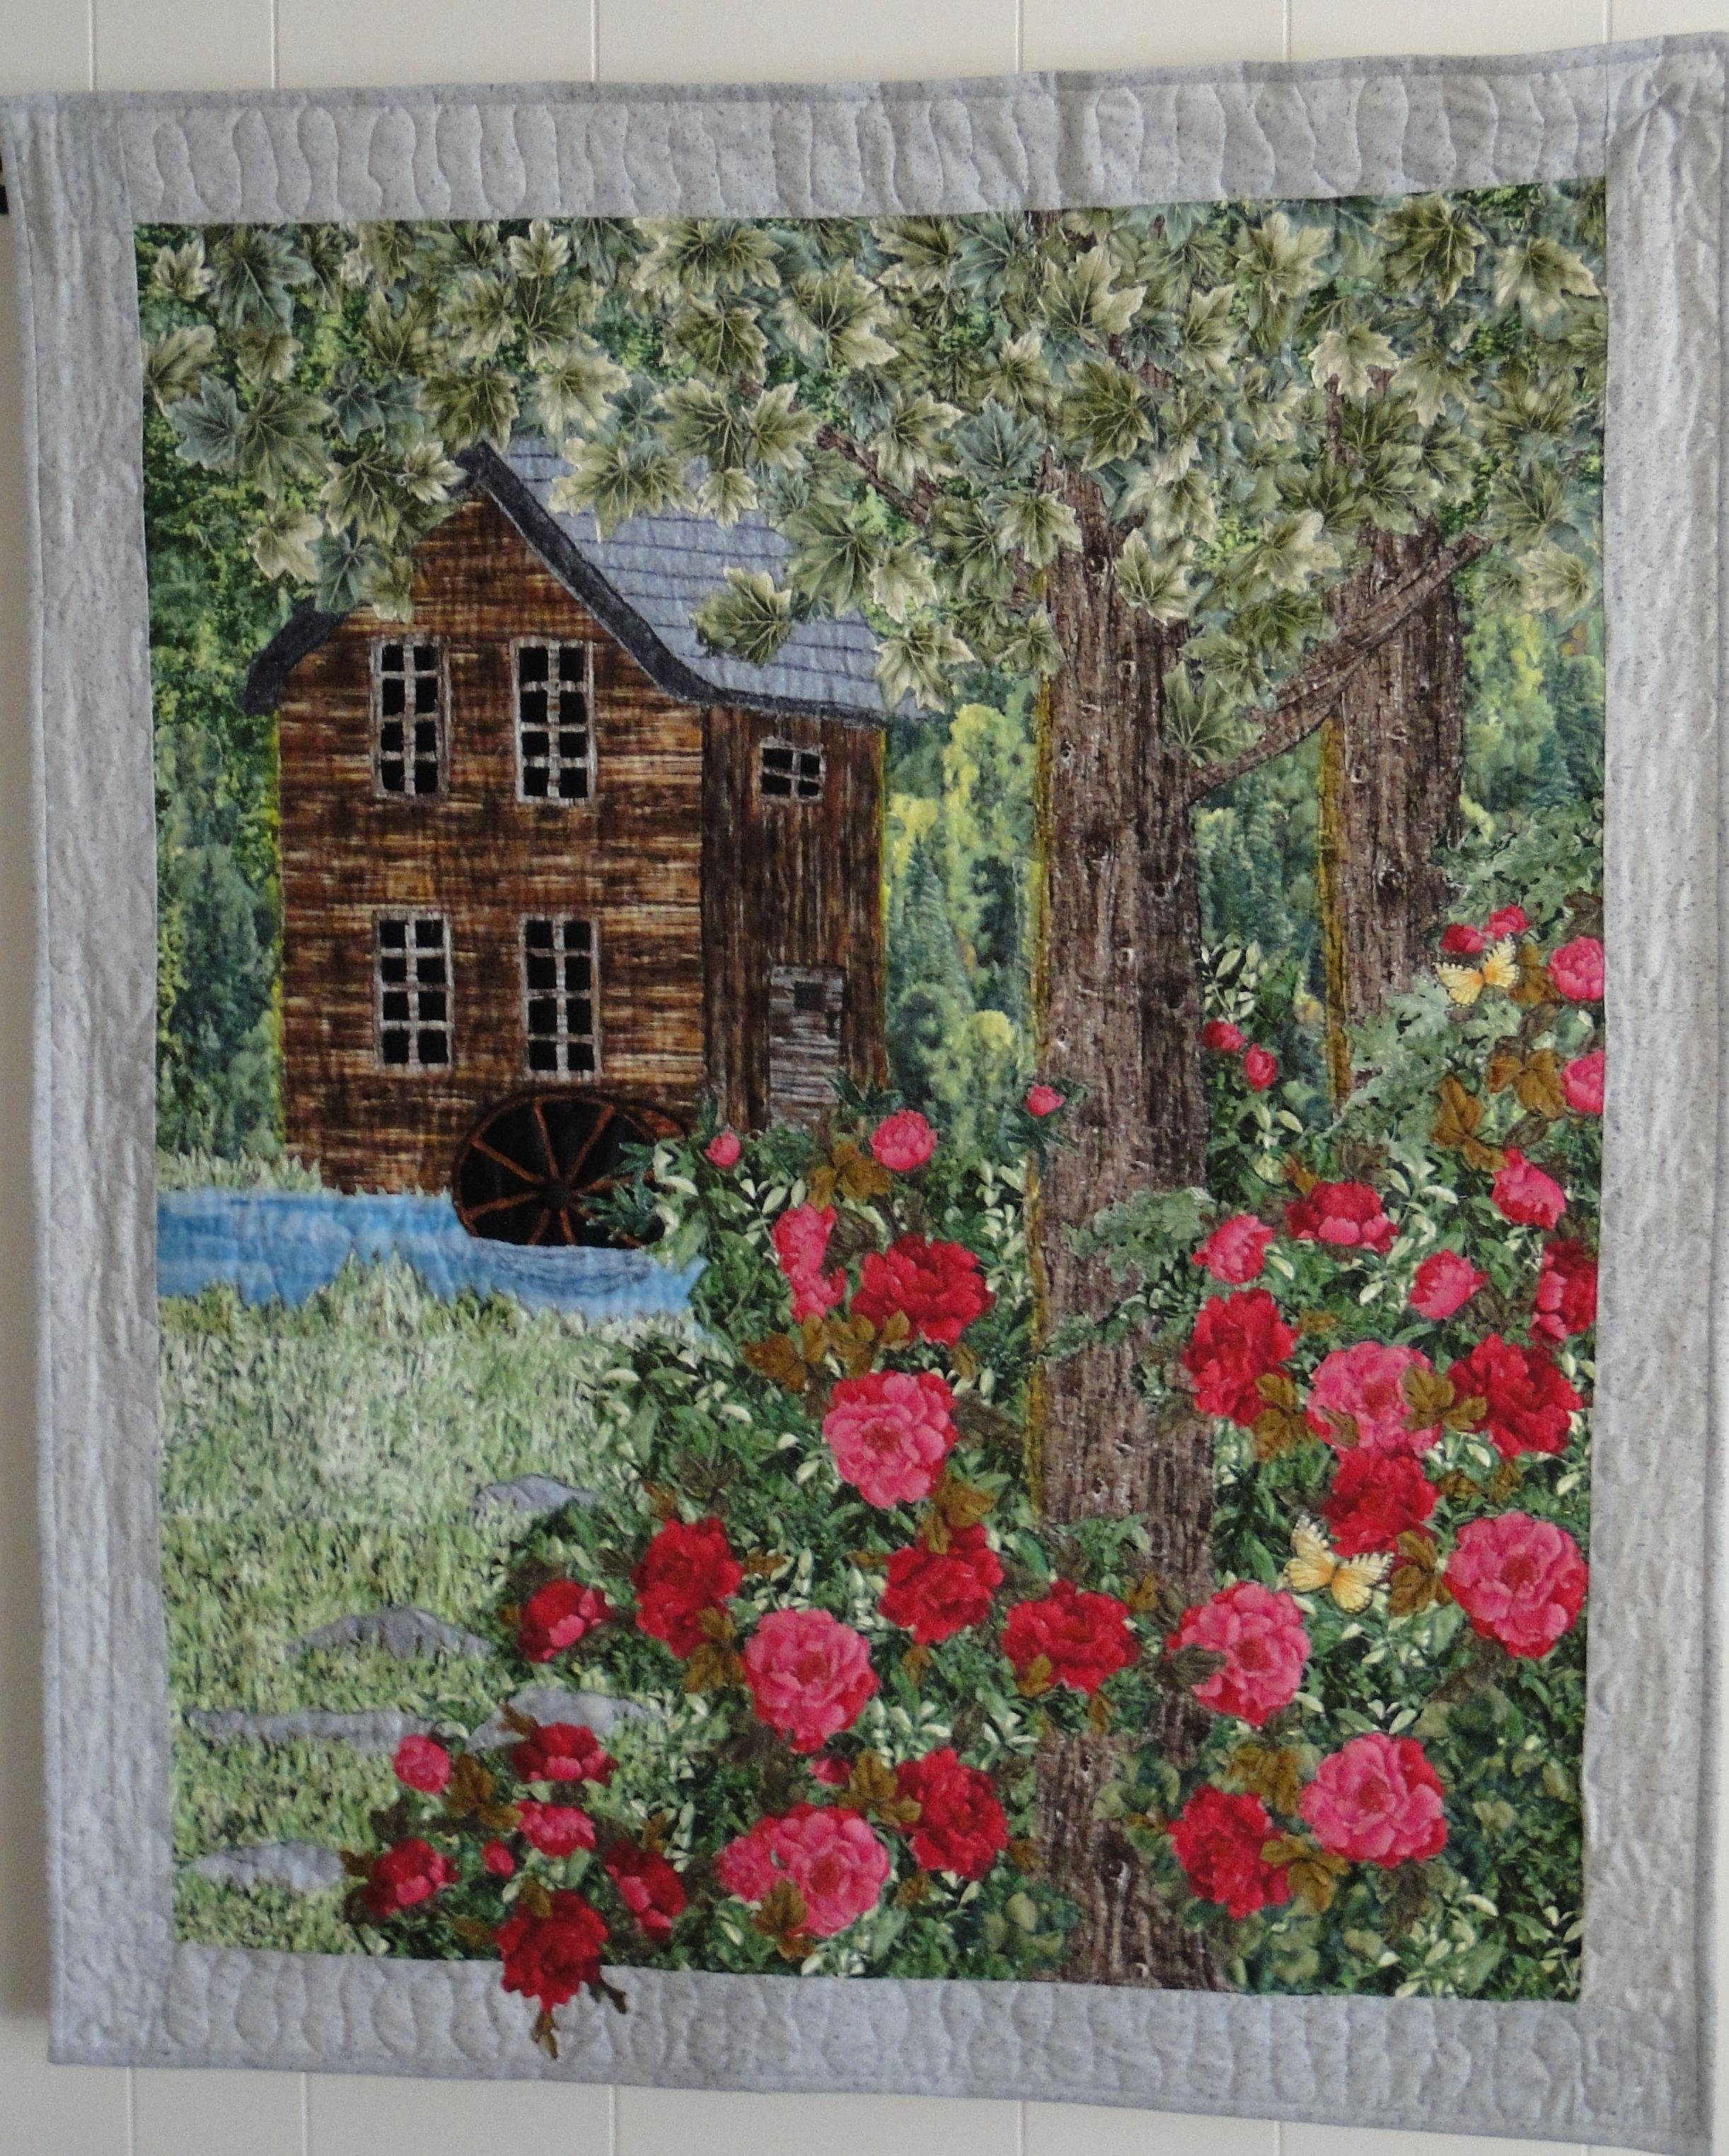 Landscape Quilts | The Old Mill | Quilts: #2 Landscape & Art ... : art quilts pinterest - Adamdwight.com